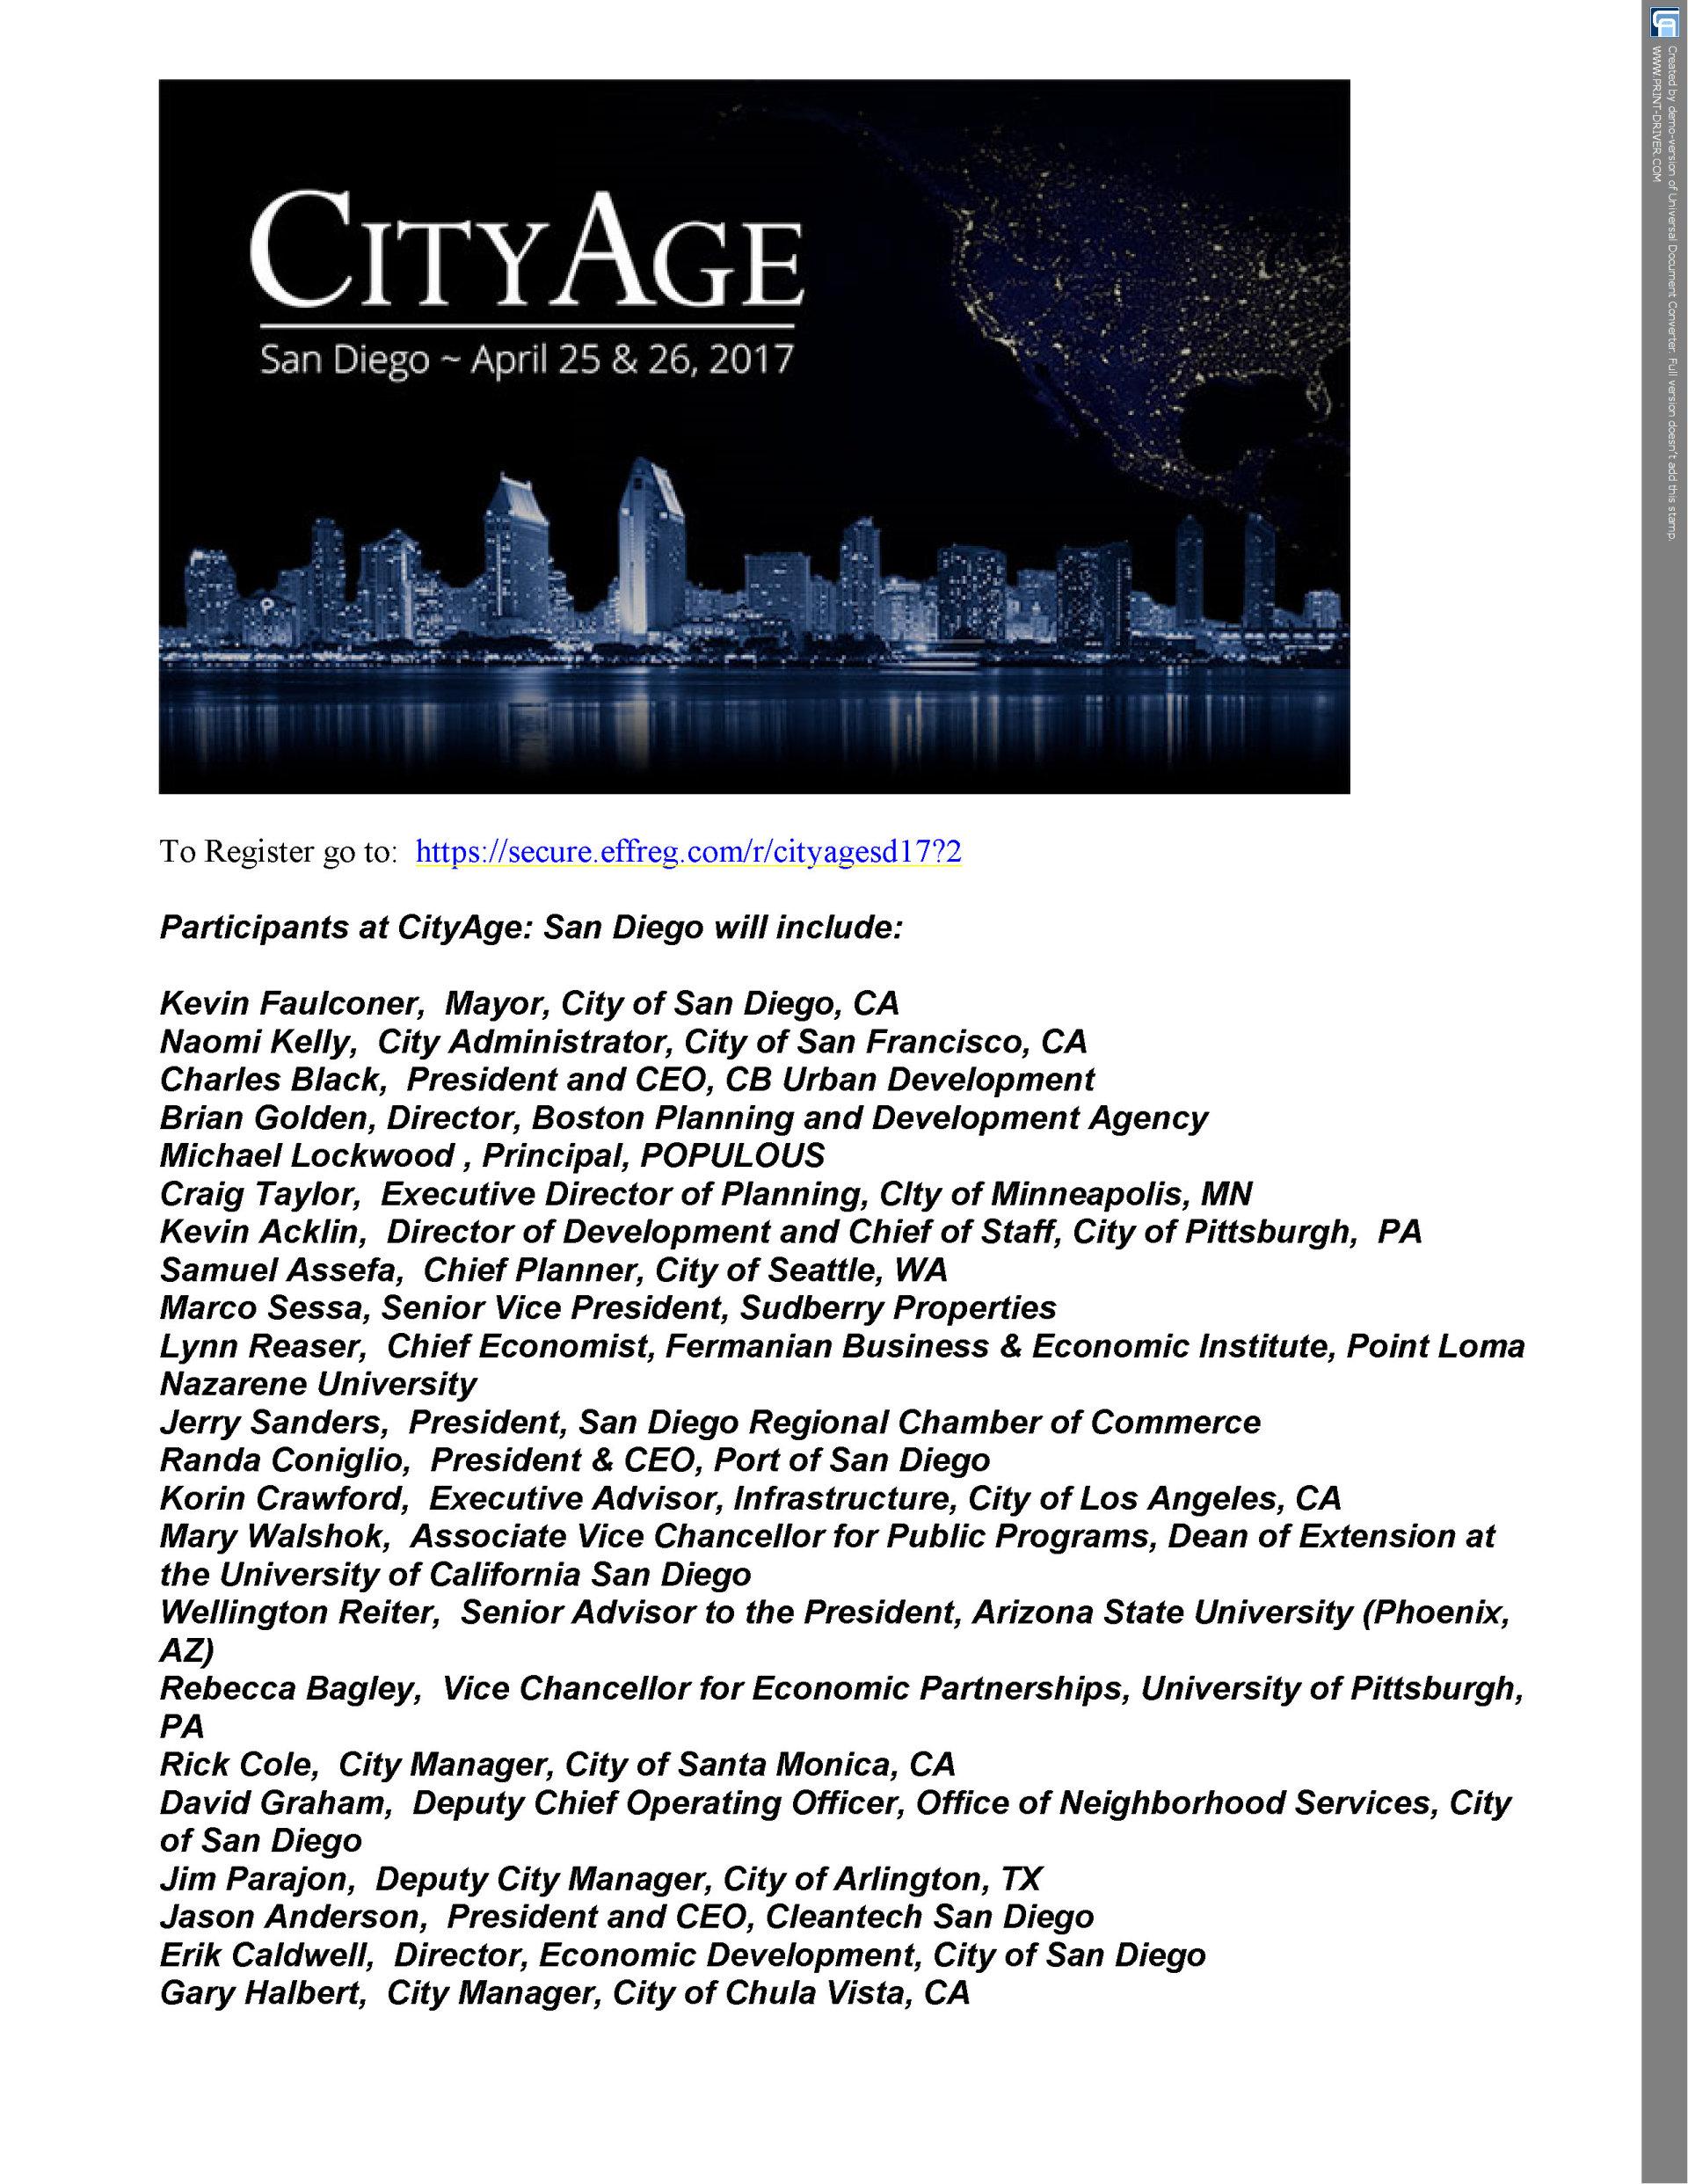 City-Age-Flyer-jpeg-w1920.jpg